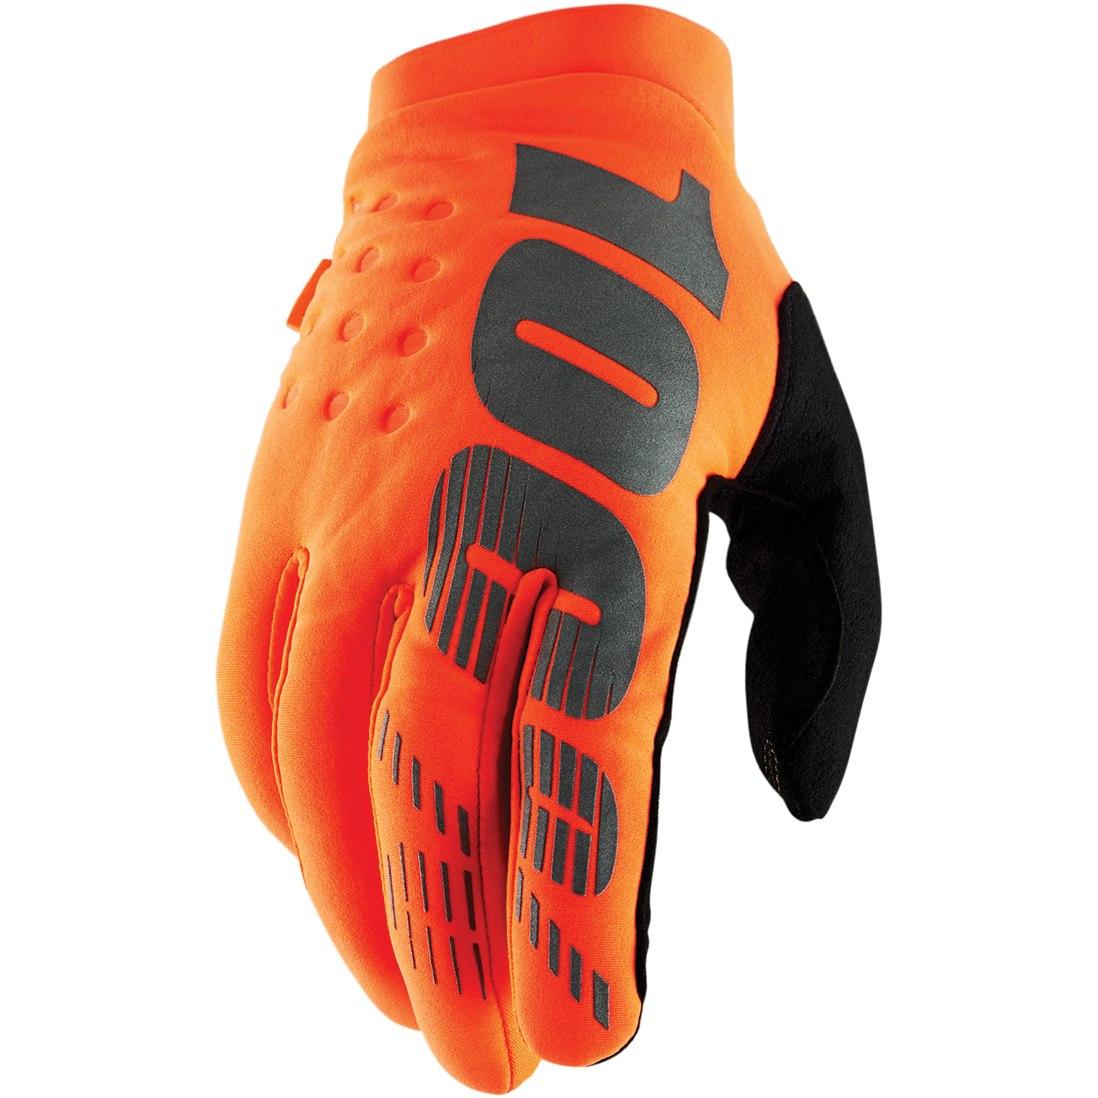 100% Brisker Cold Weather Glove - Fluo Orange/Black